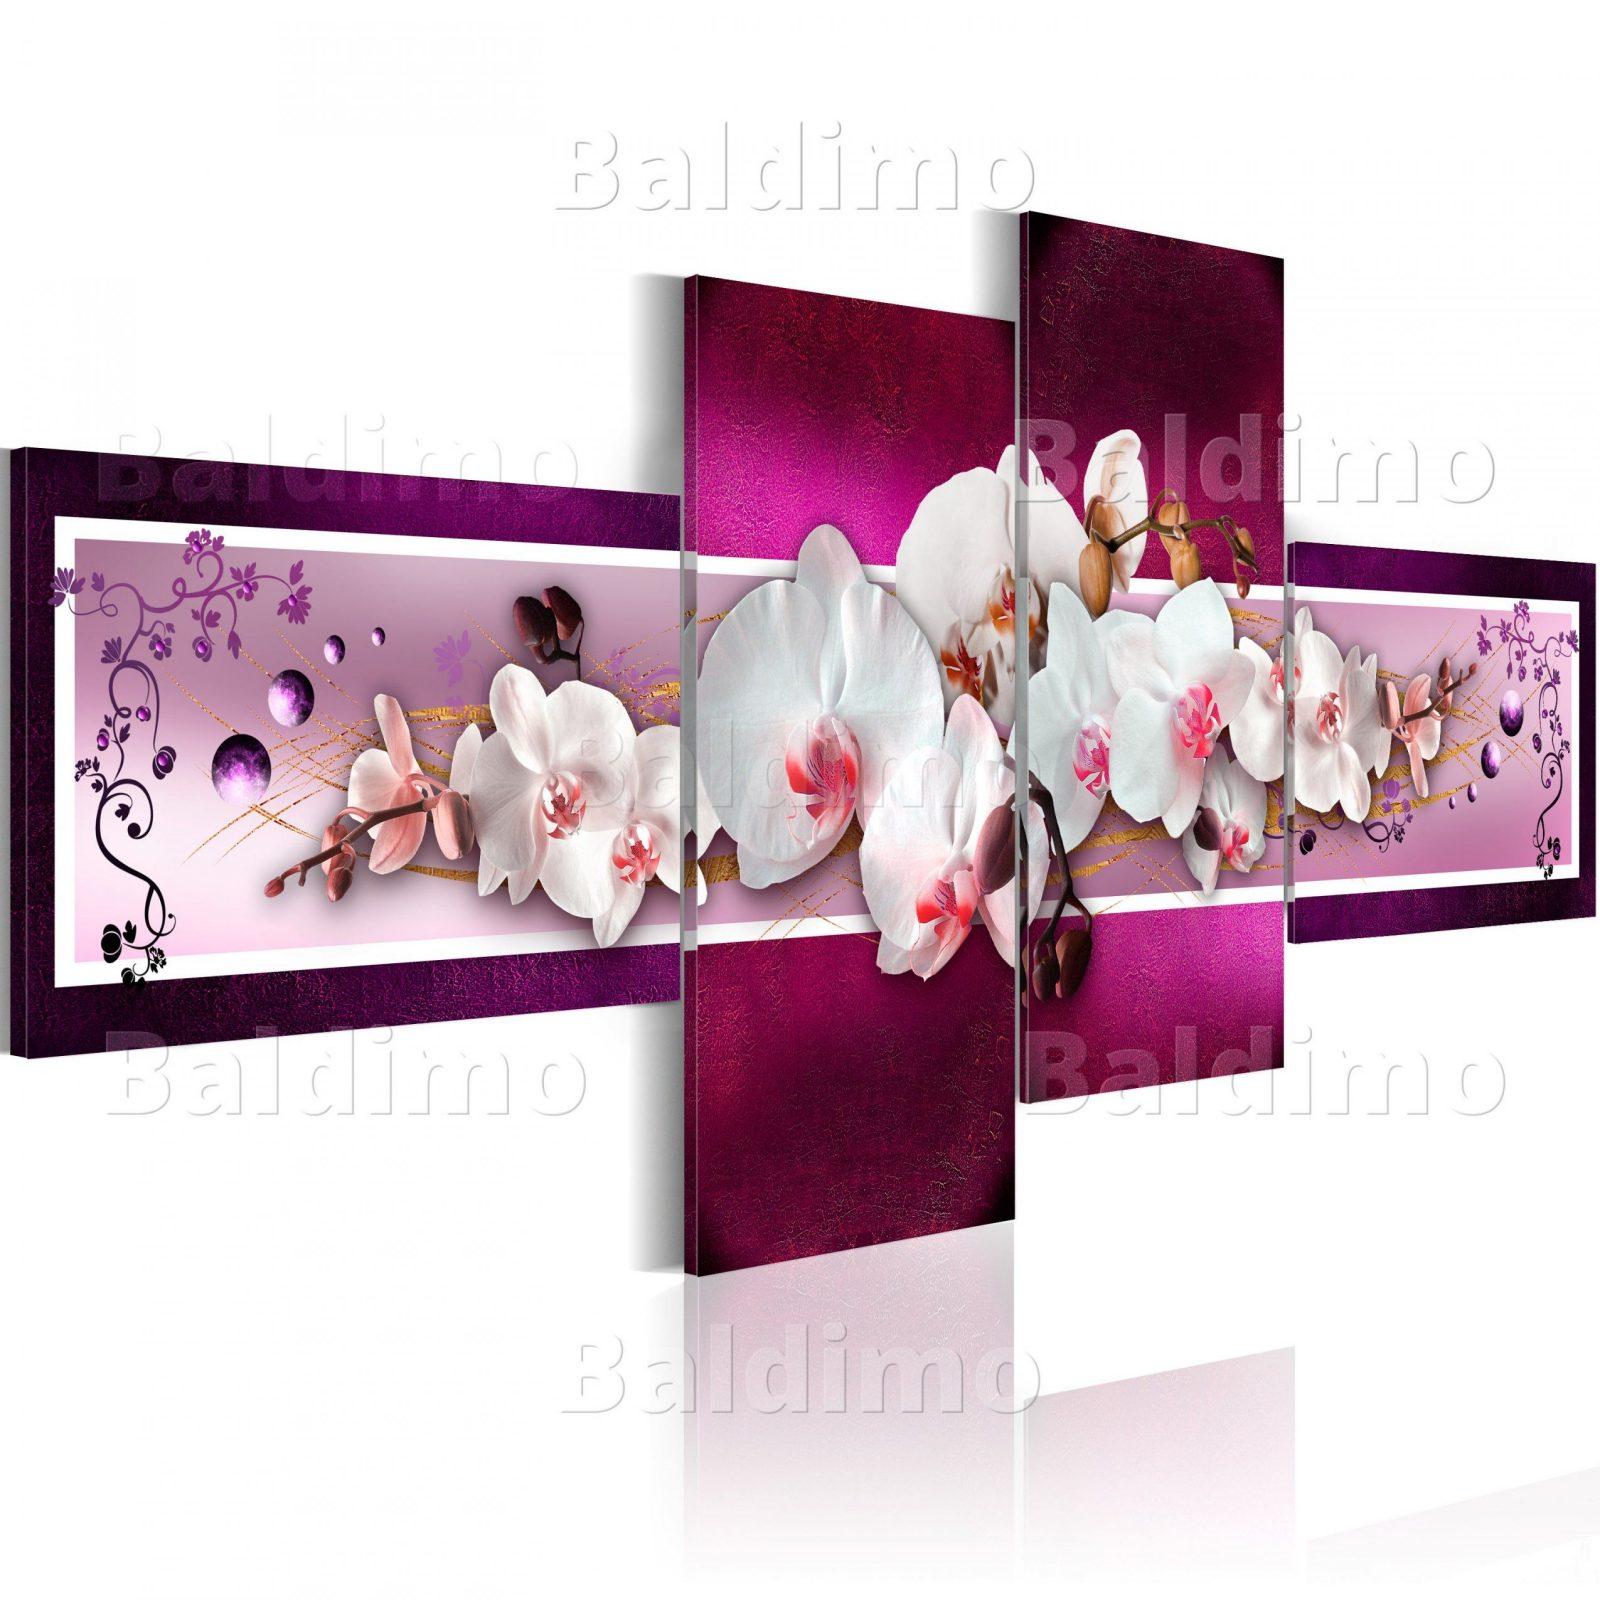 Wandbilder Xxl Blumen Orchidee Abstrakt Violett Leinwand Bilder 4 von Orchideen Bilder Auf Leinwand Photo